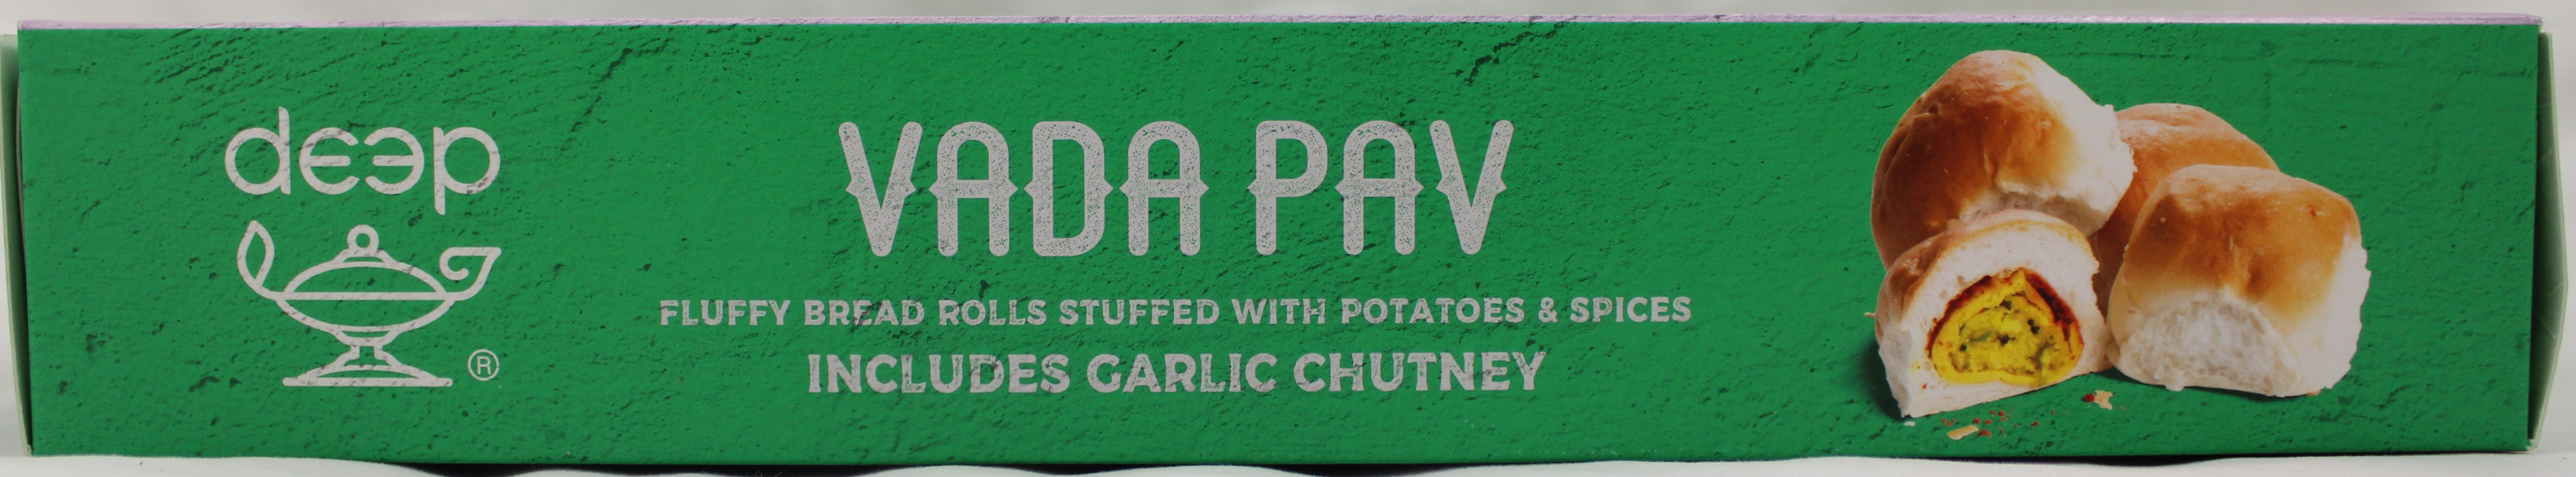 Vada Pav With Chutney (8pc)18 Oz